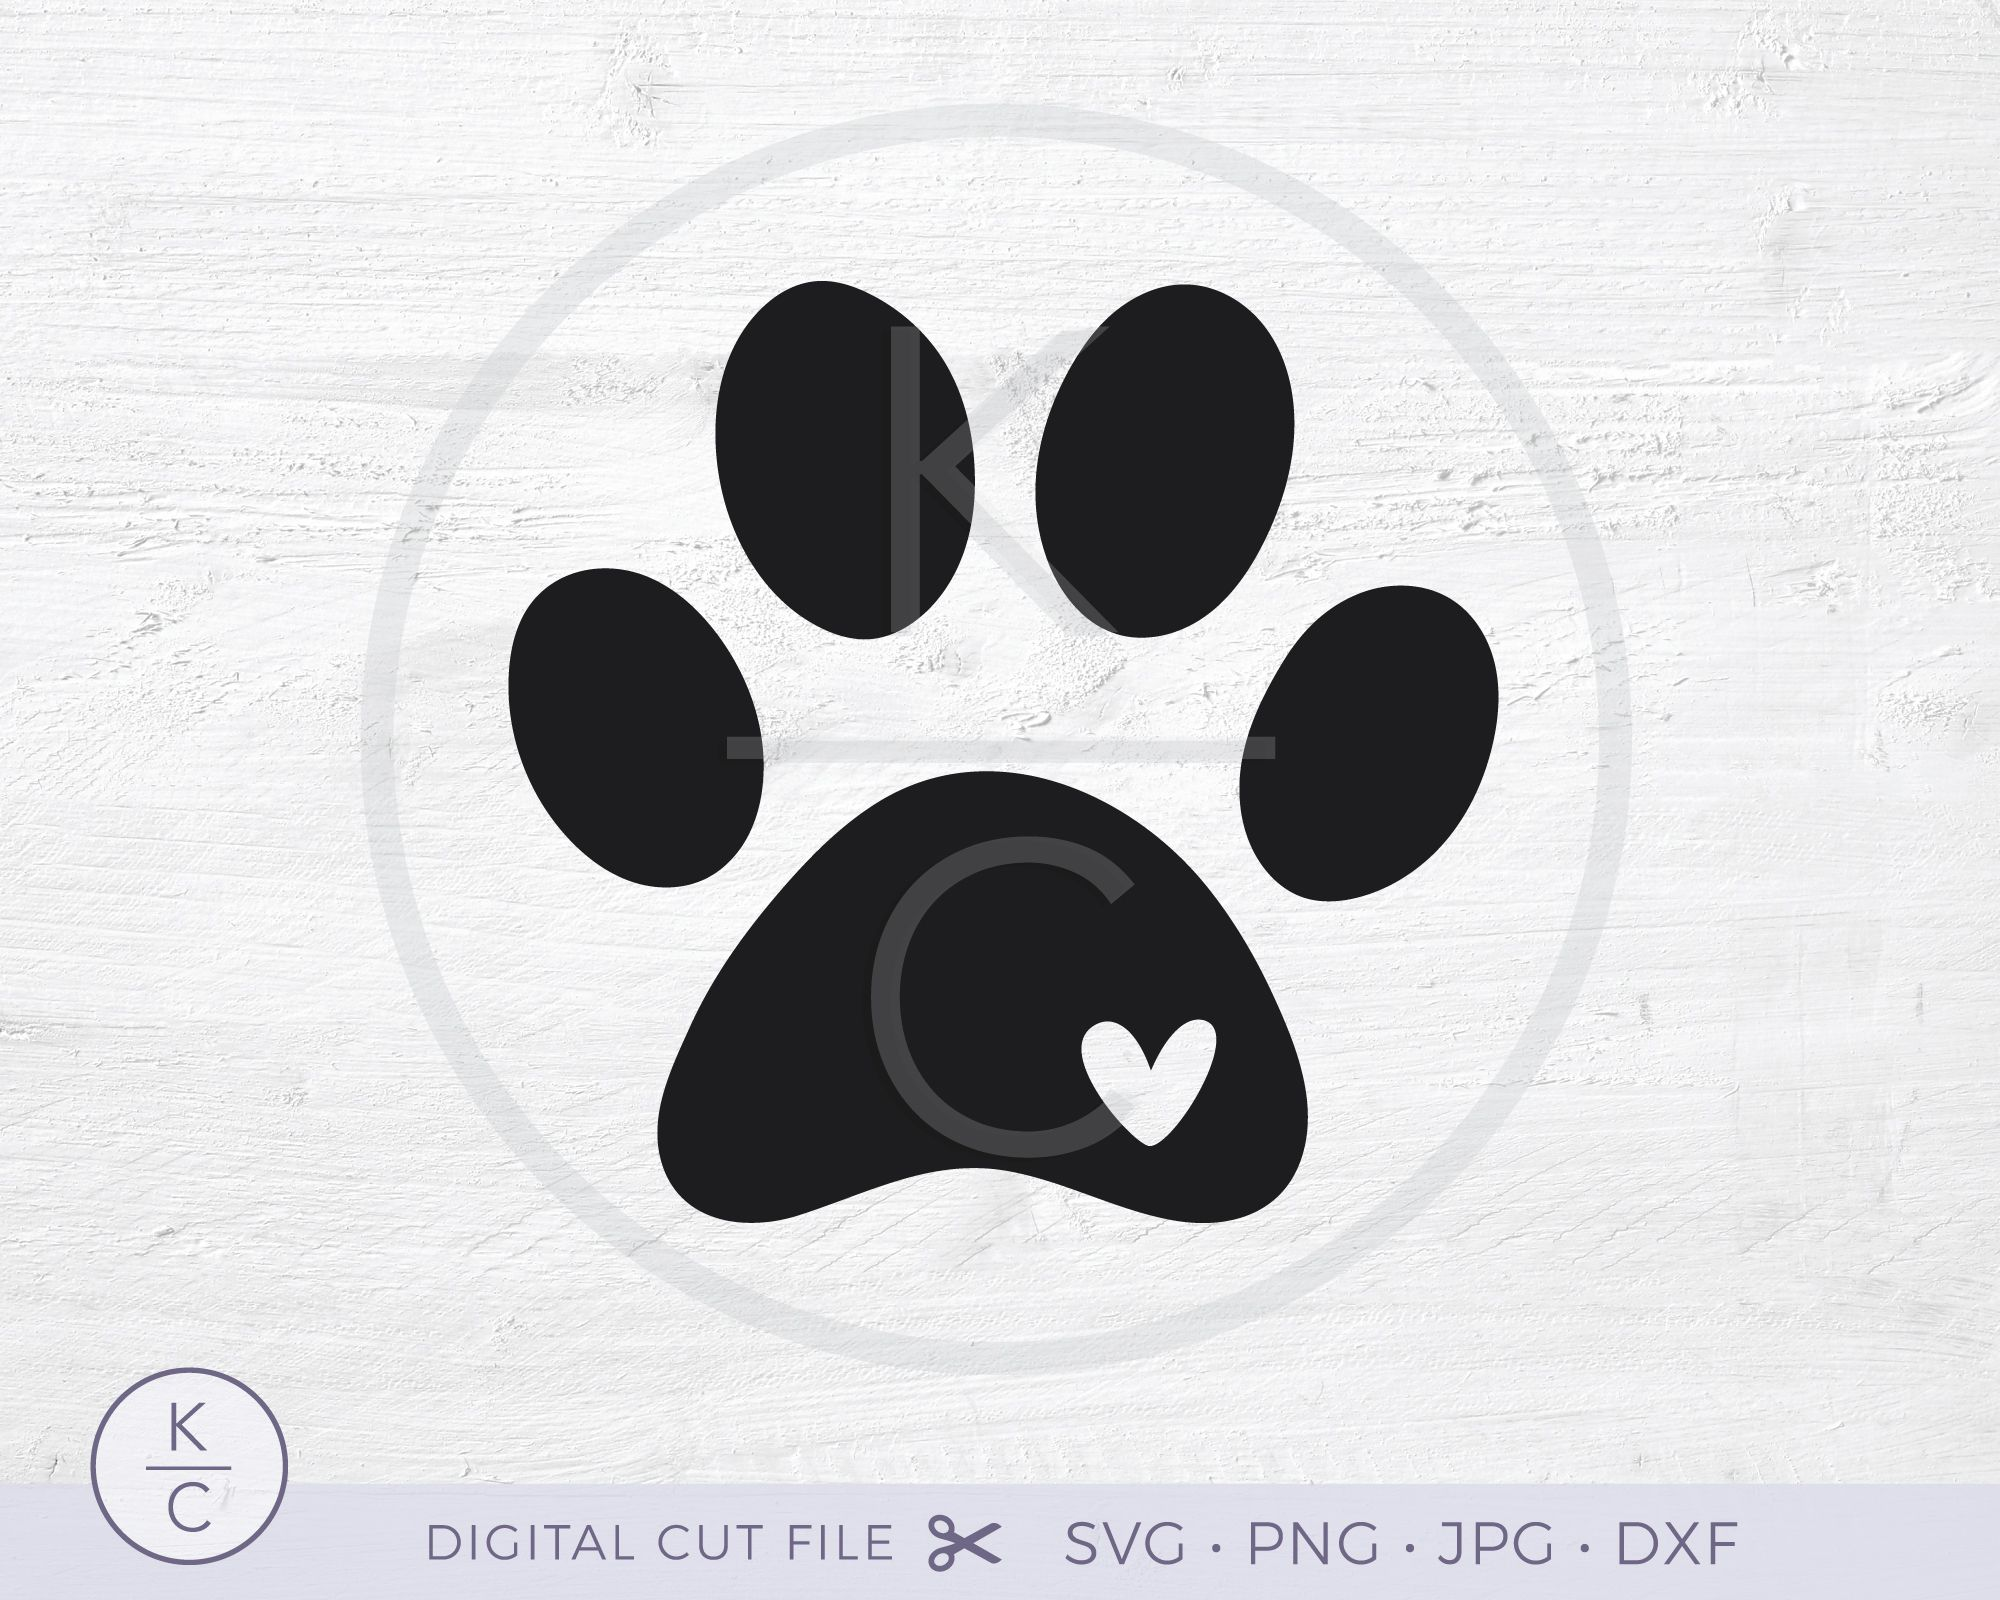 Paw Print Svg Pawprint Svg File Dog Paw Svg Animal Paw Svg Etsy Paw Print Dog Paws Artwork Prints